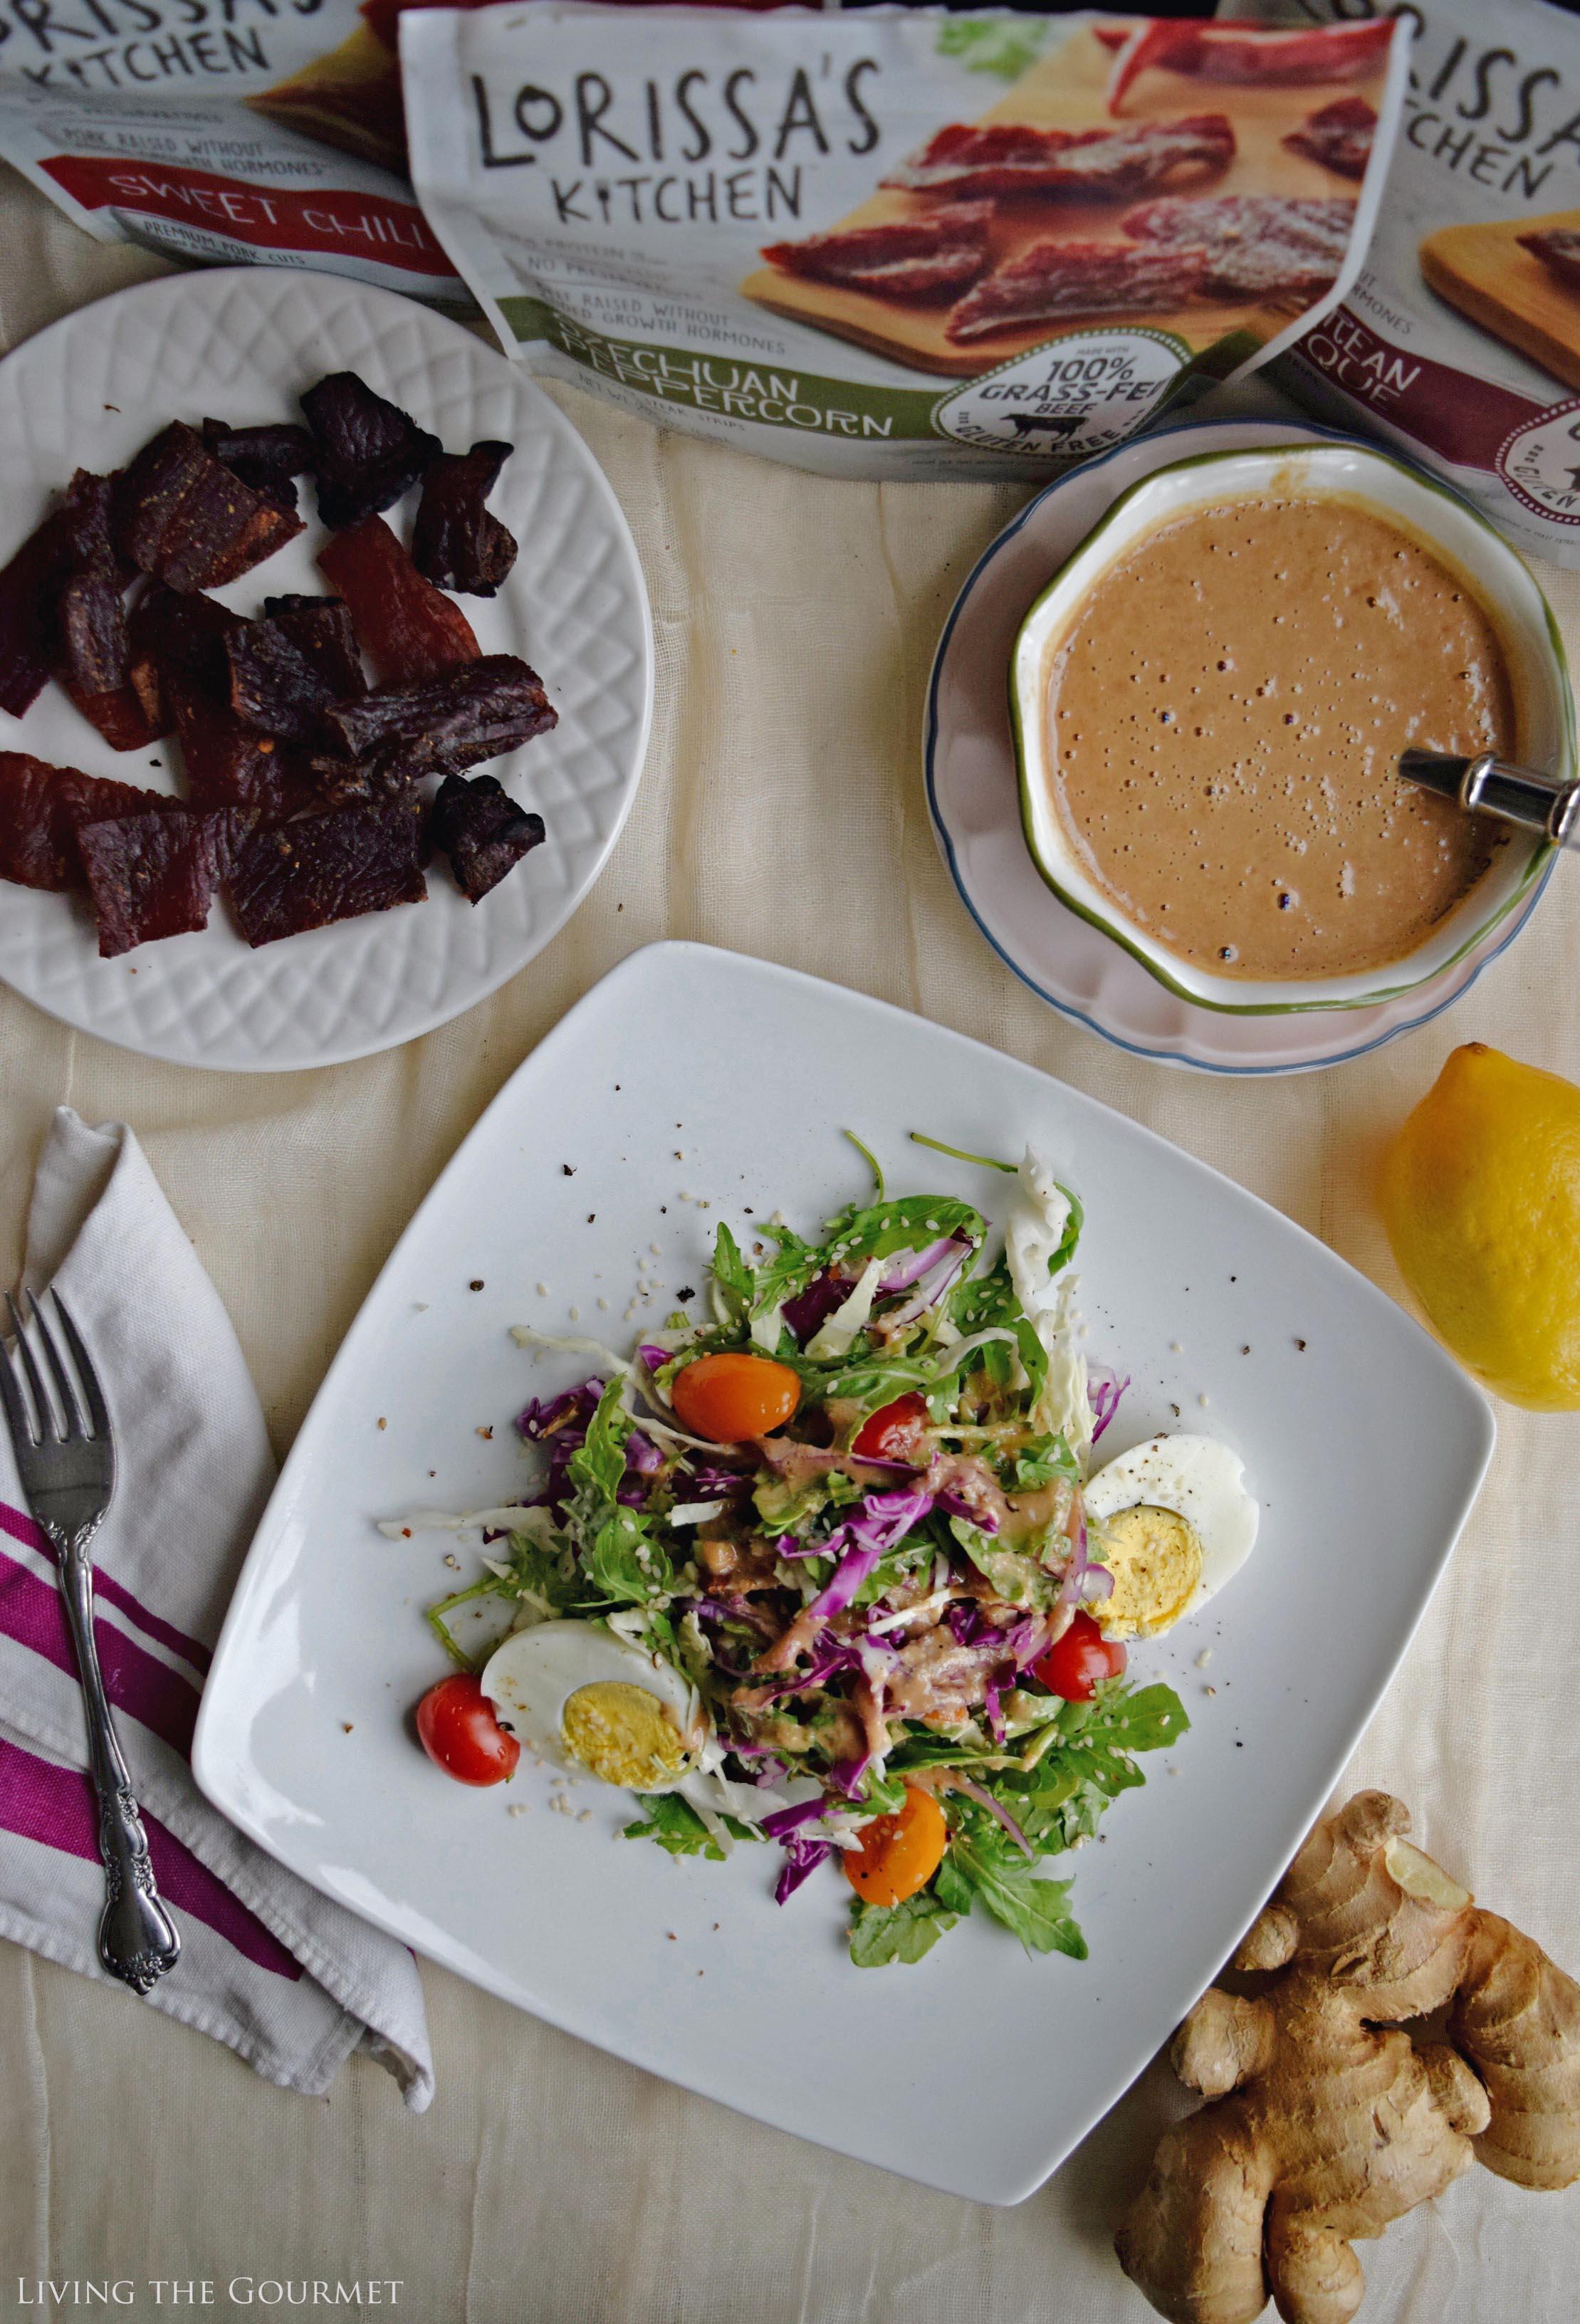 Living the Gourmet: Fresh Salad Greens with Sesame Ginger Vinaigrette   #SavvySnacking #ad